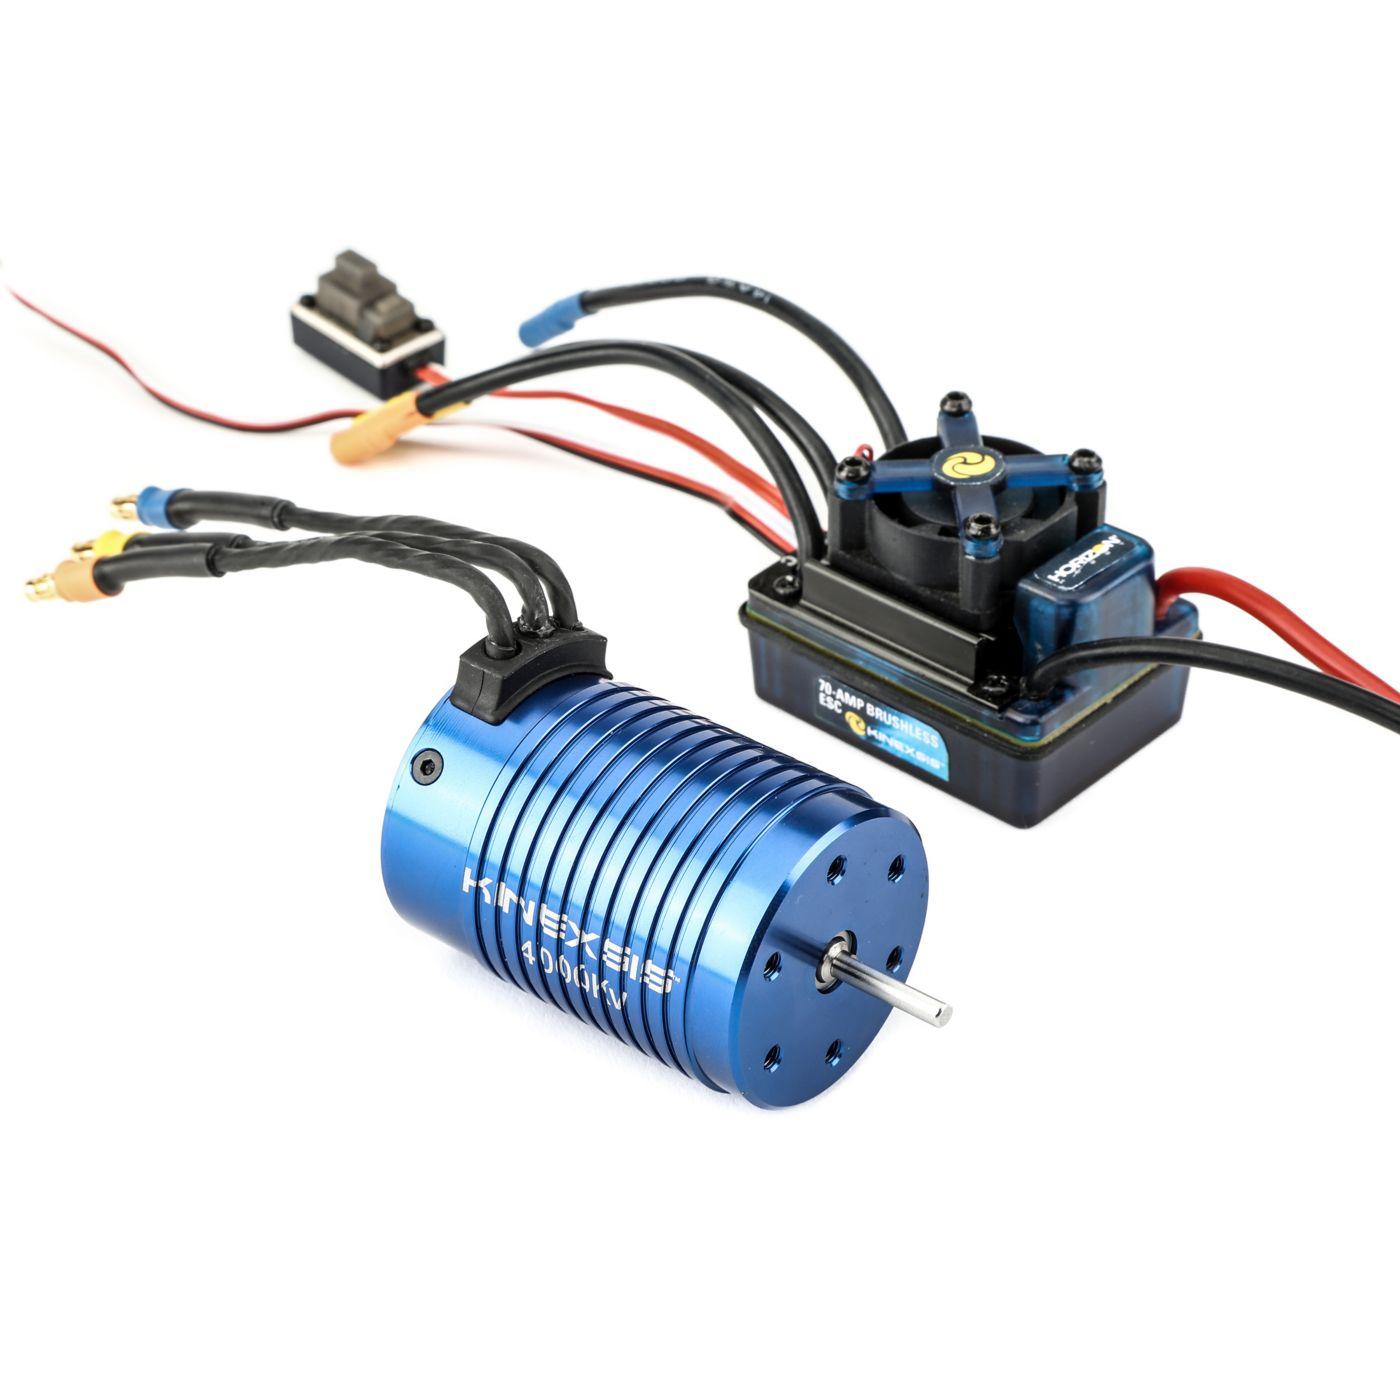 medium resolution of 1 10 4 pole 4000kv esc motor combo horizonhobby north american edition electrical wiring harness with eicv escv